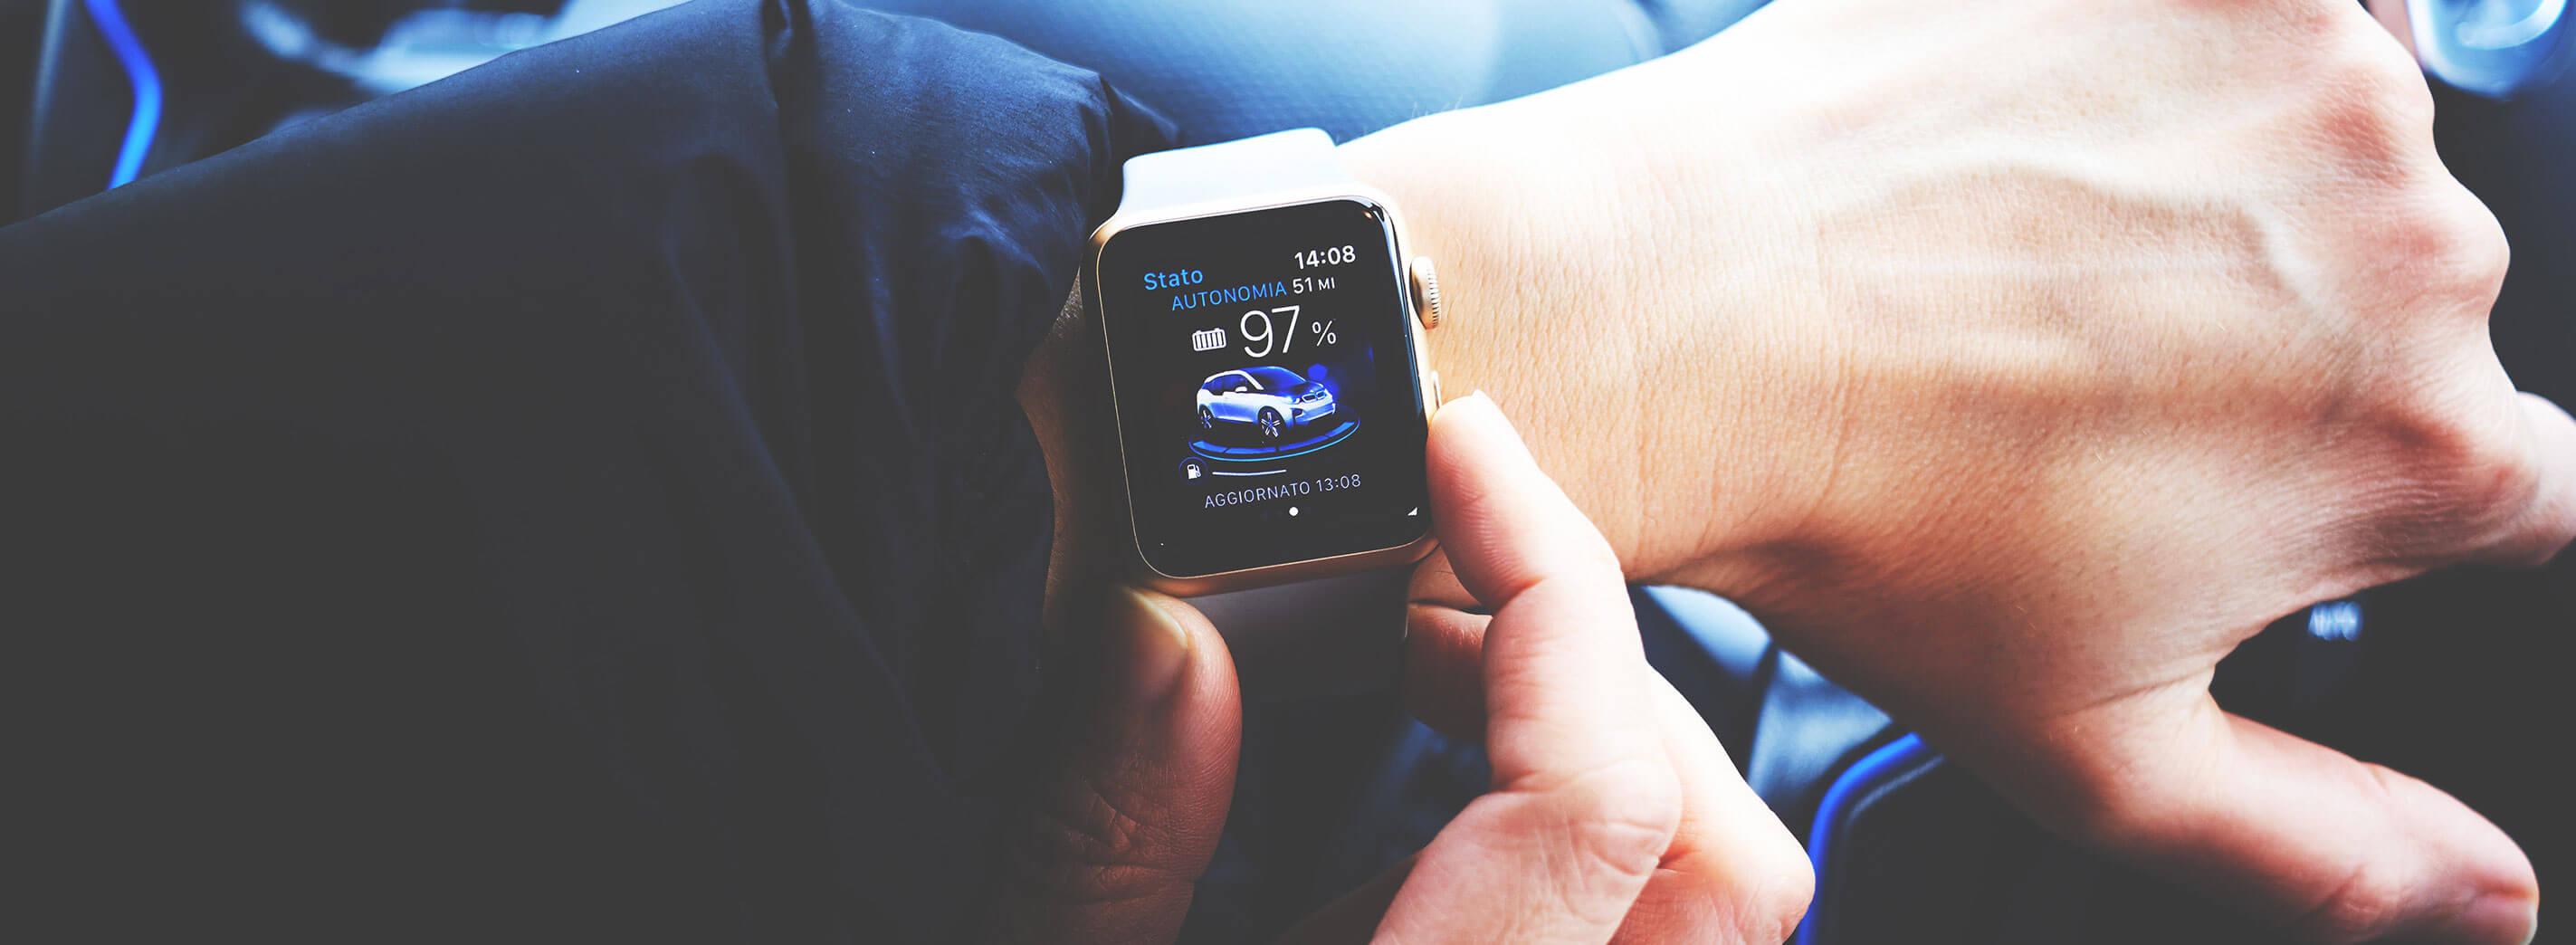 microsoft azure iot suite watch